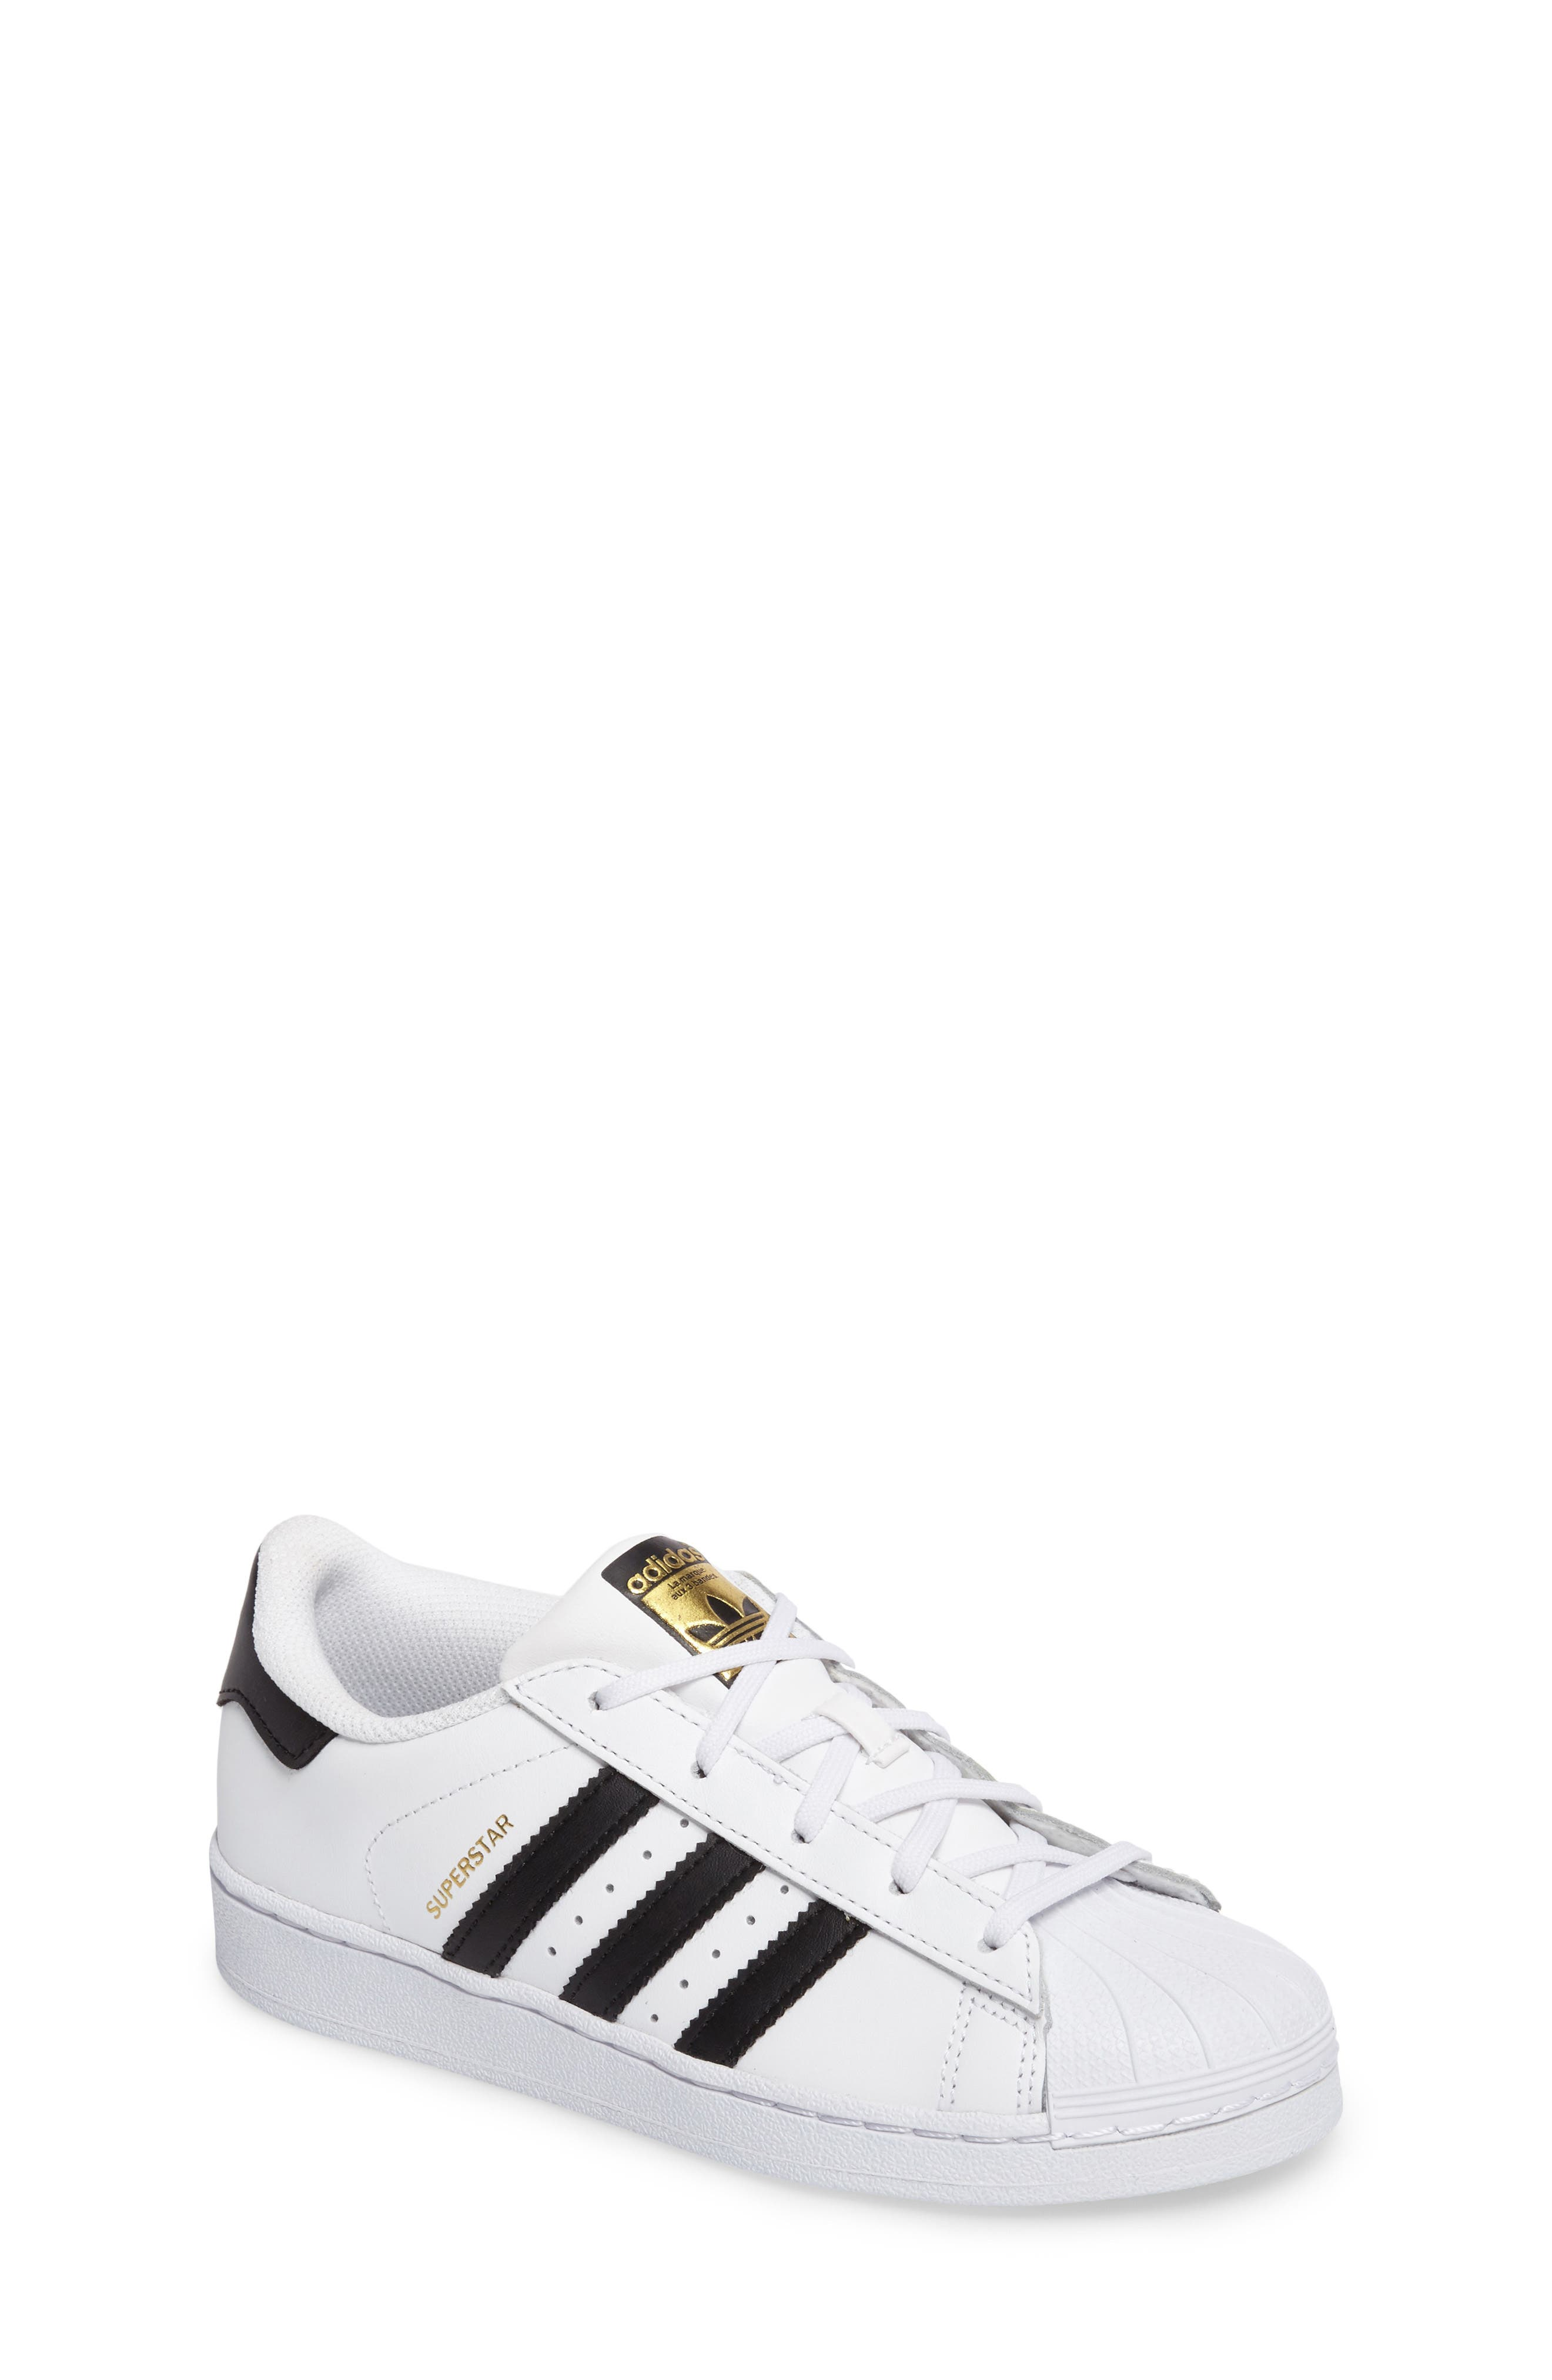 ADIDAS, 'Superstar Foundation' Sneaker, Main thumbnail 1, color, WHITE/ BLACK